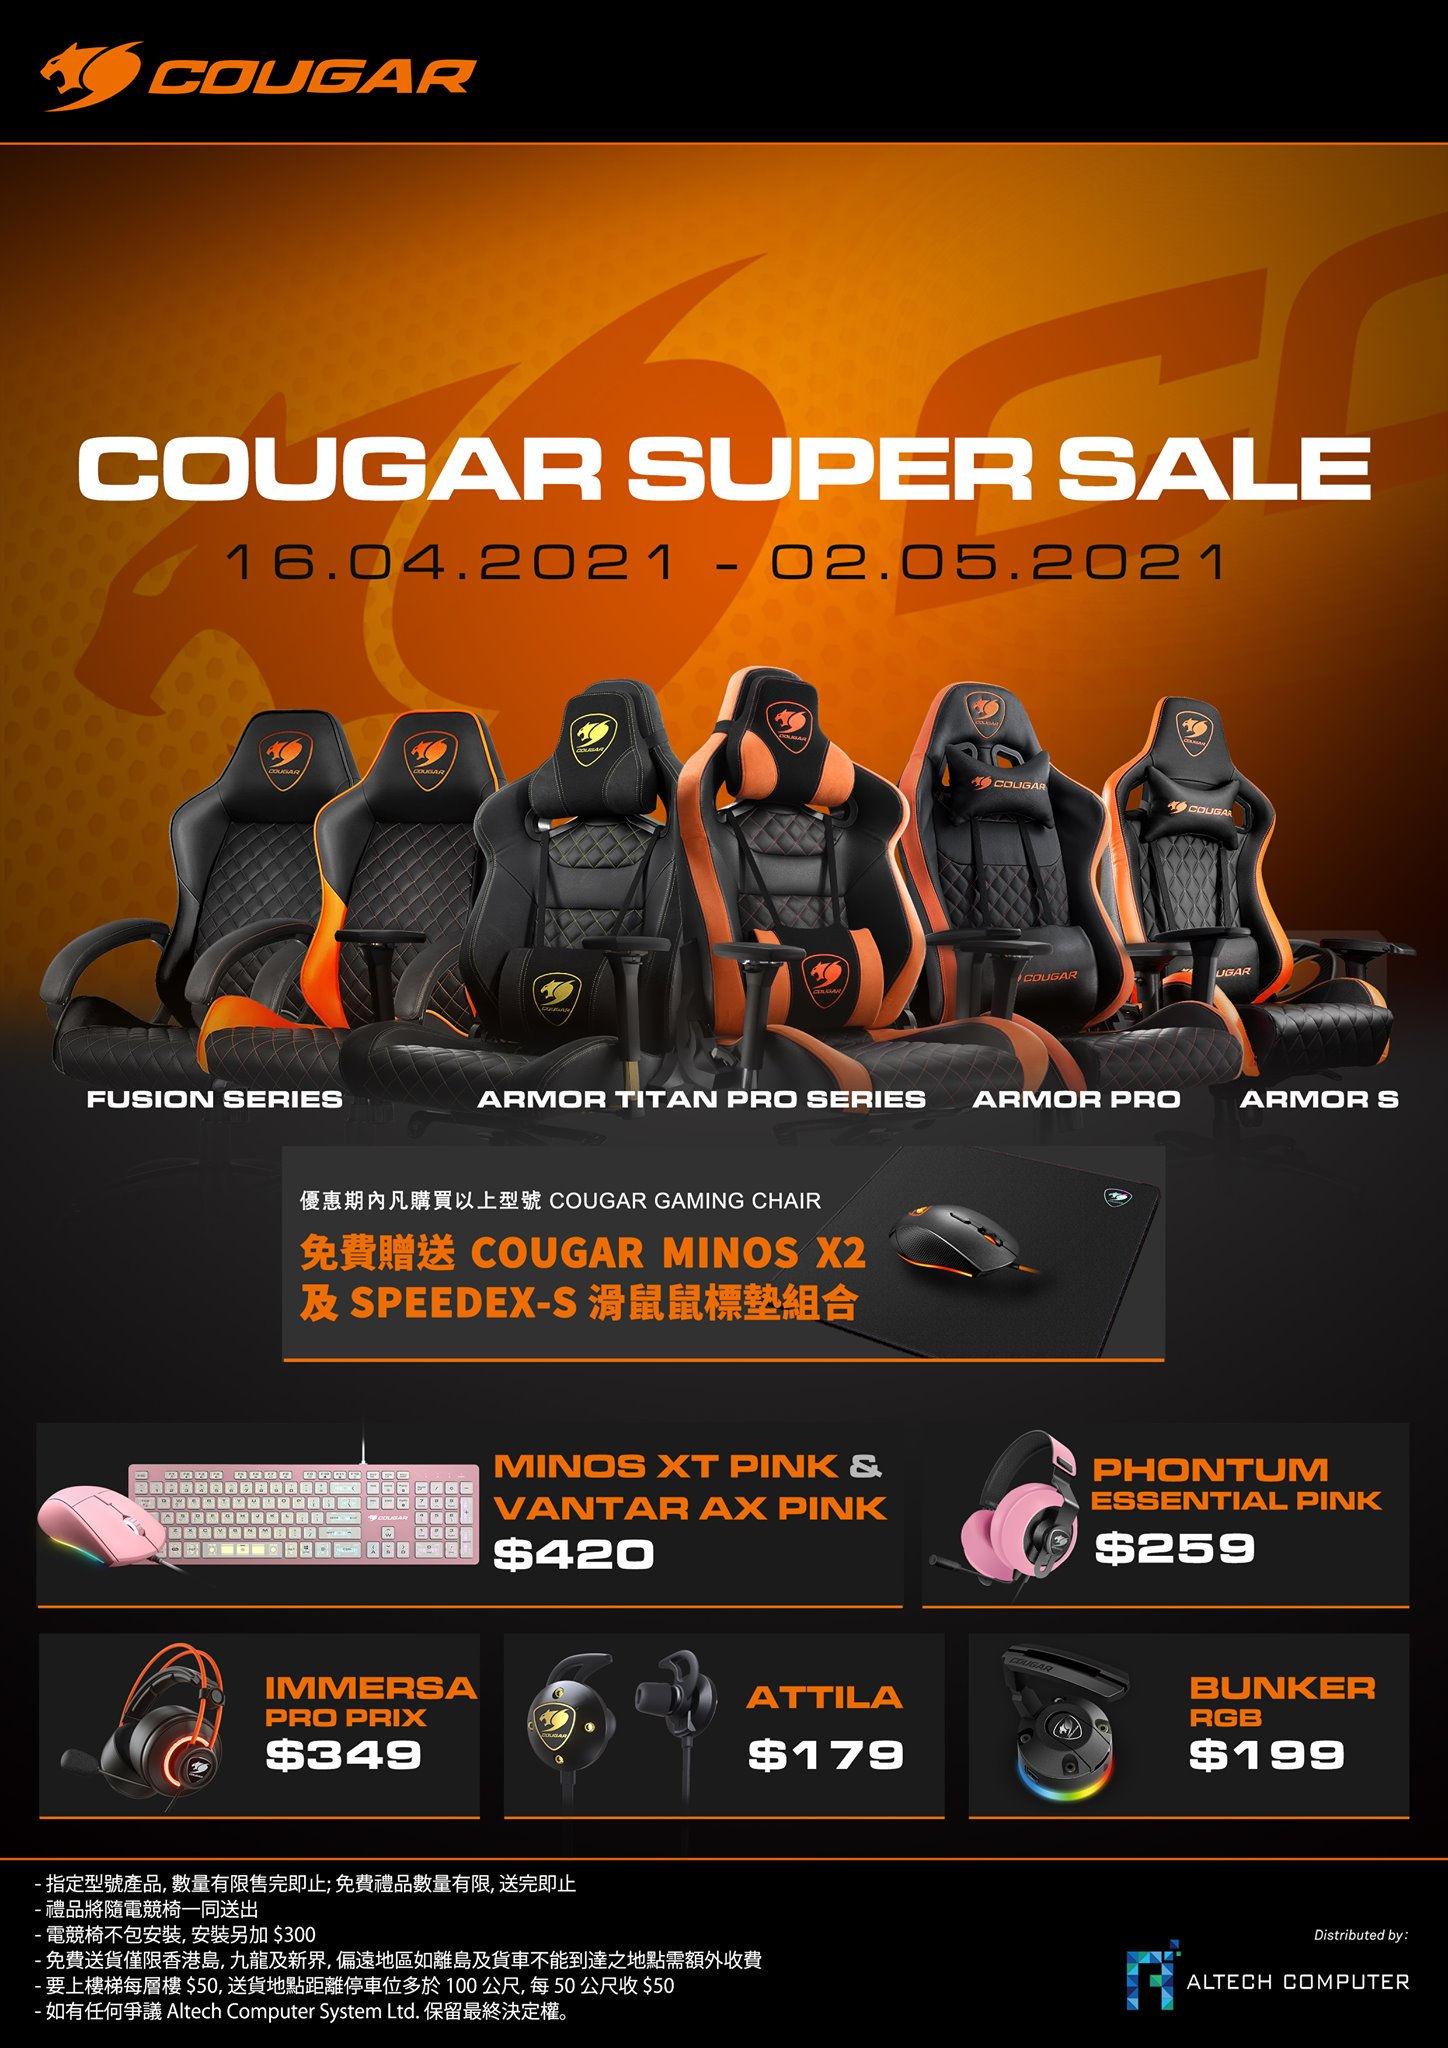 Cougar Super Sale